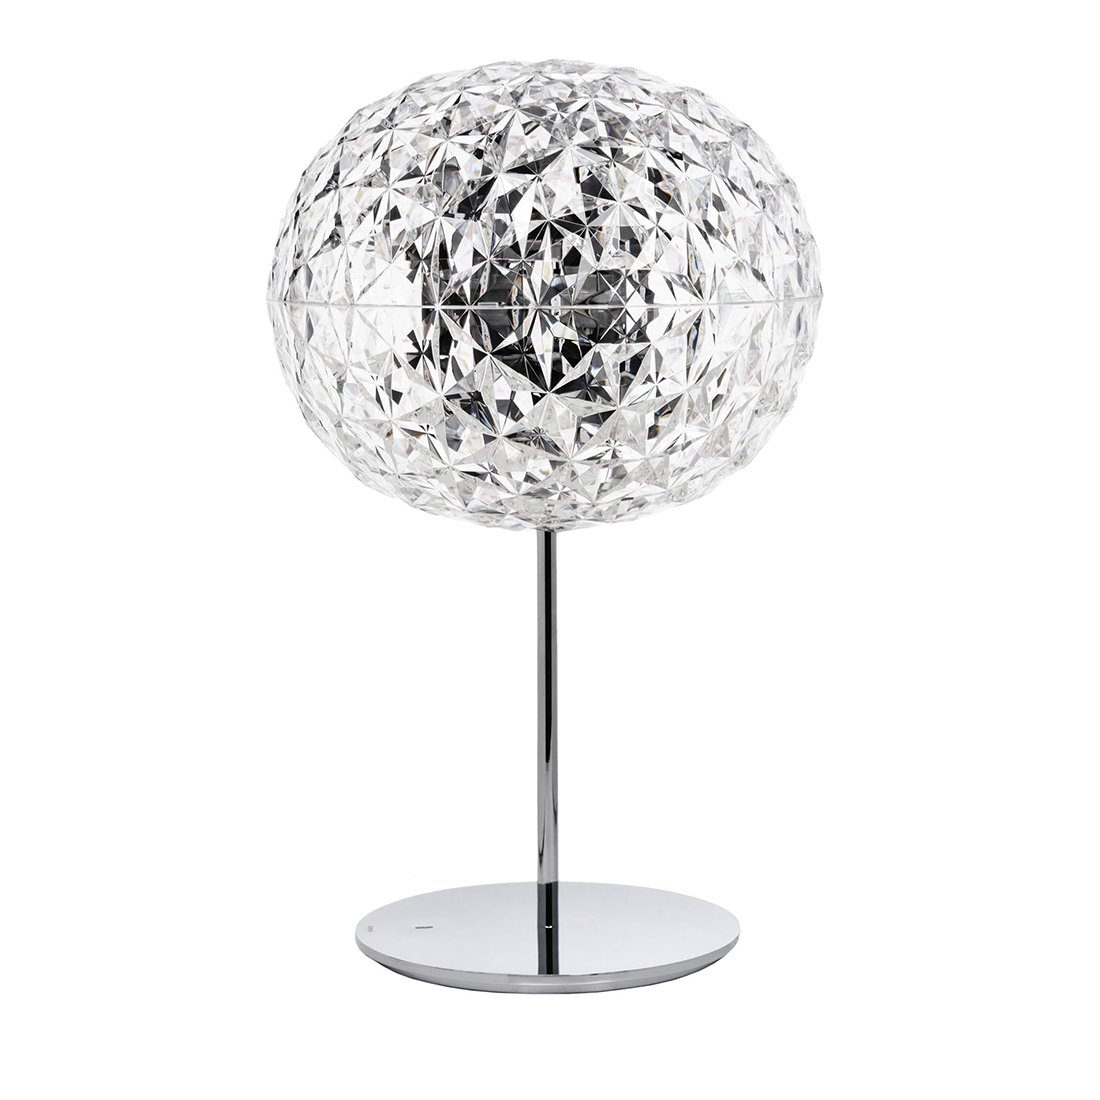 Kartell Planet Tafellamp - Kristal